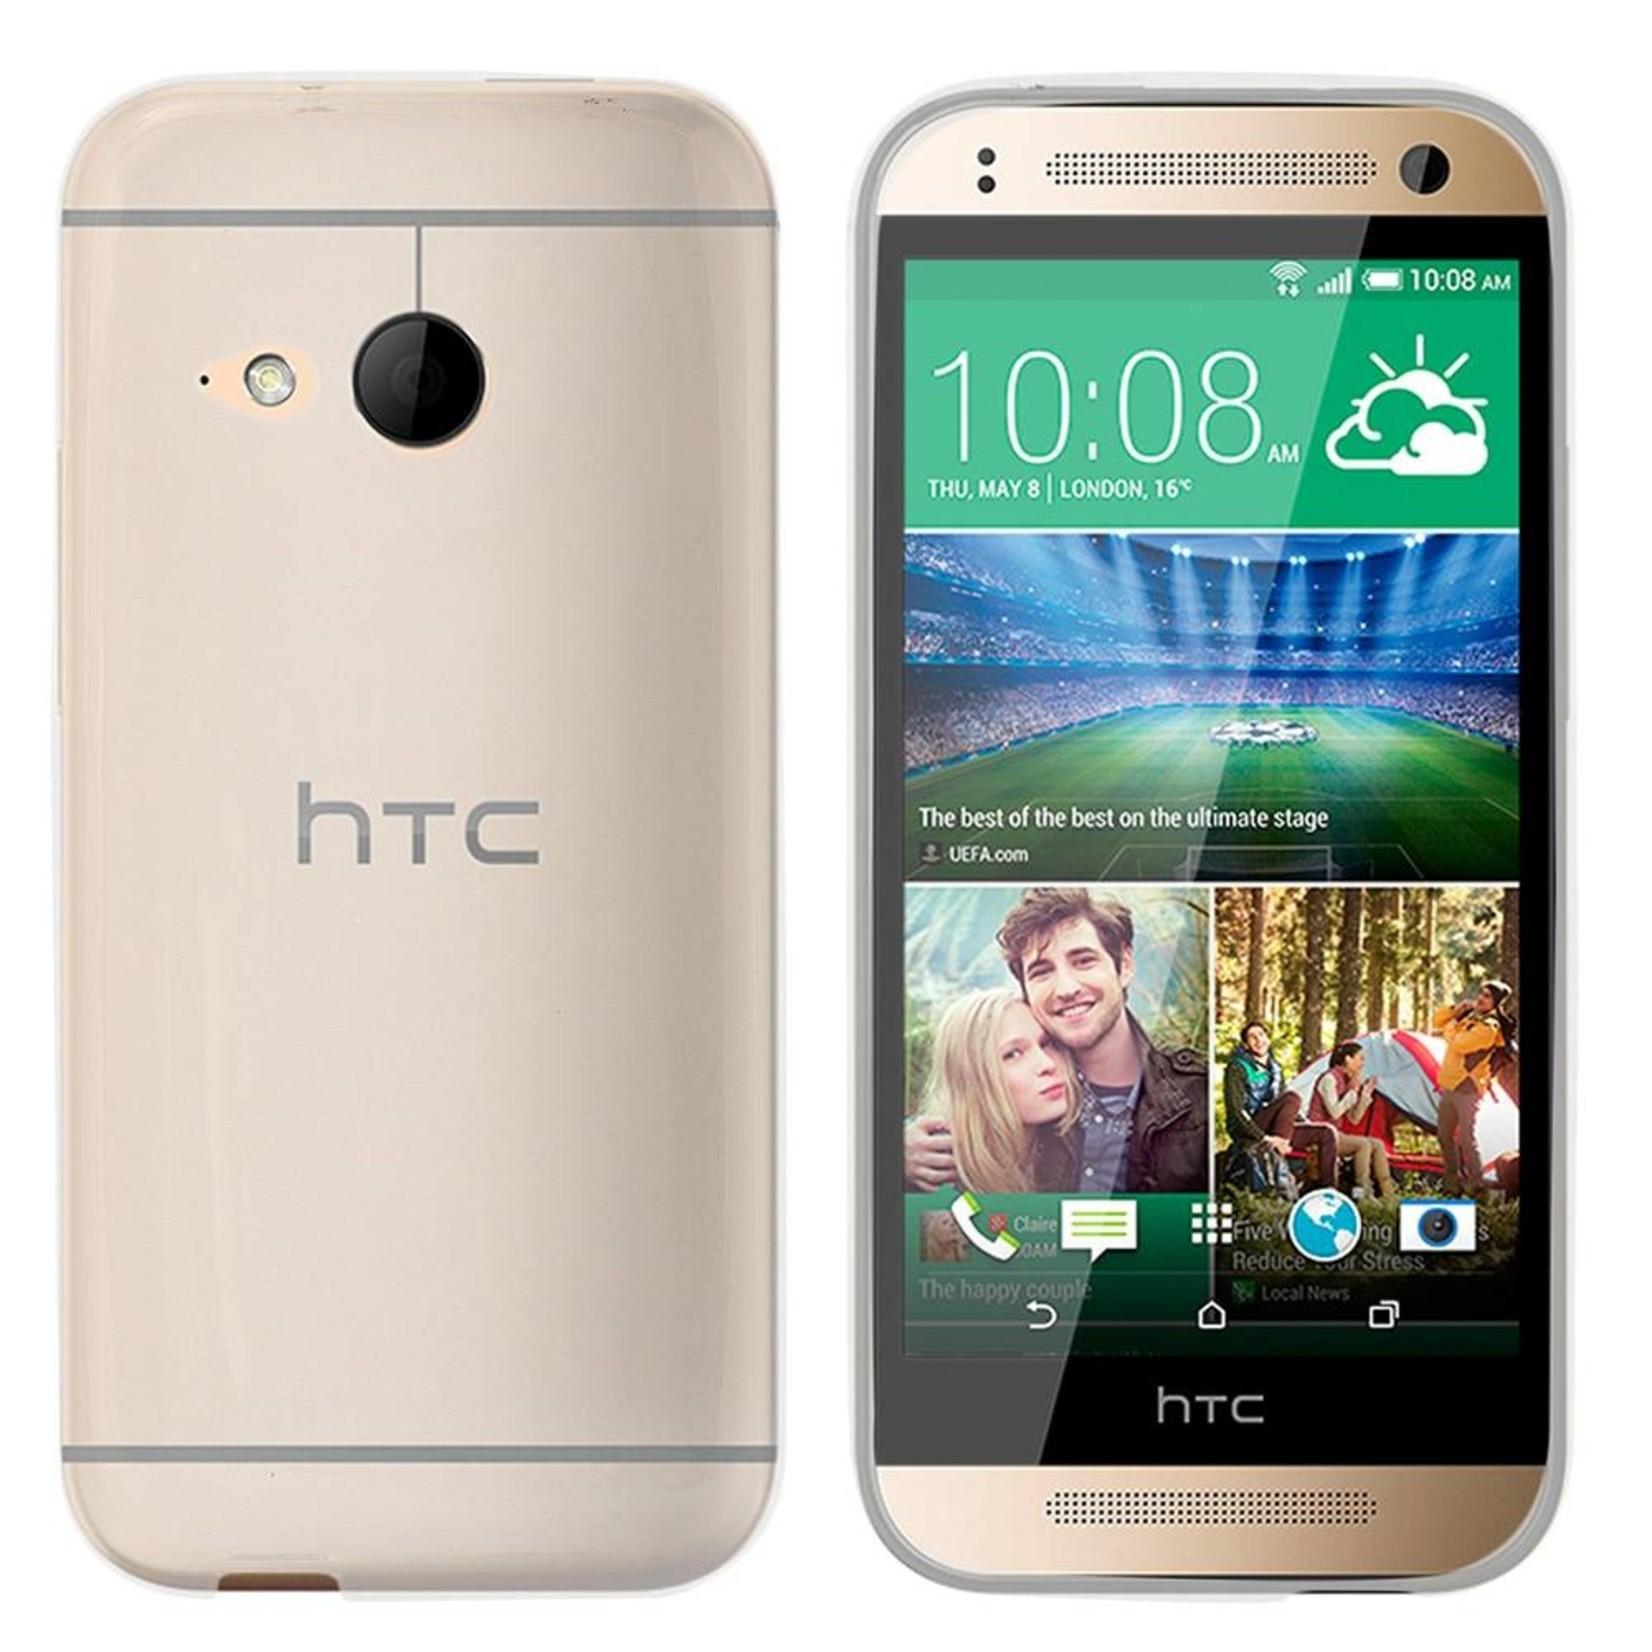 Colorfone Hoesje CoolSkin3T voor HTC One Mini 2 Tr. Wit